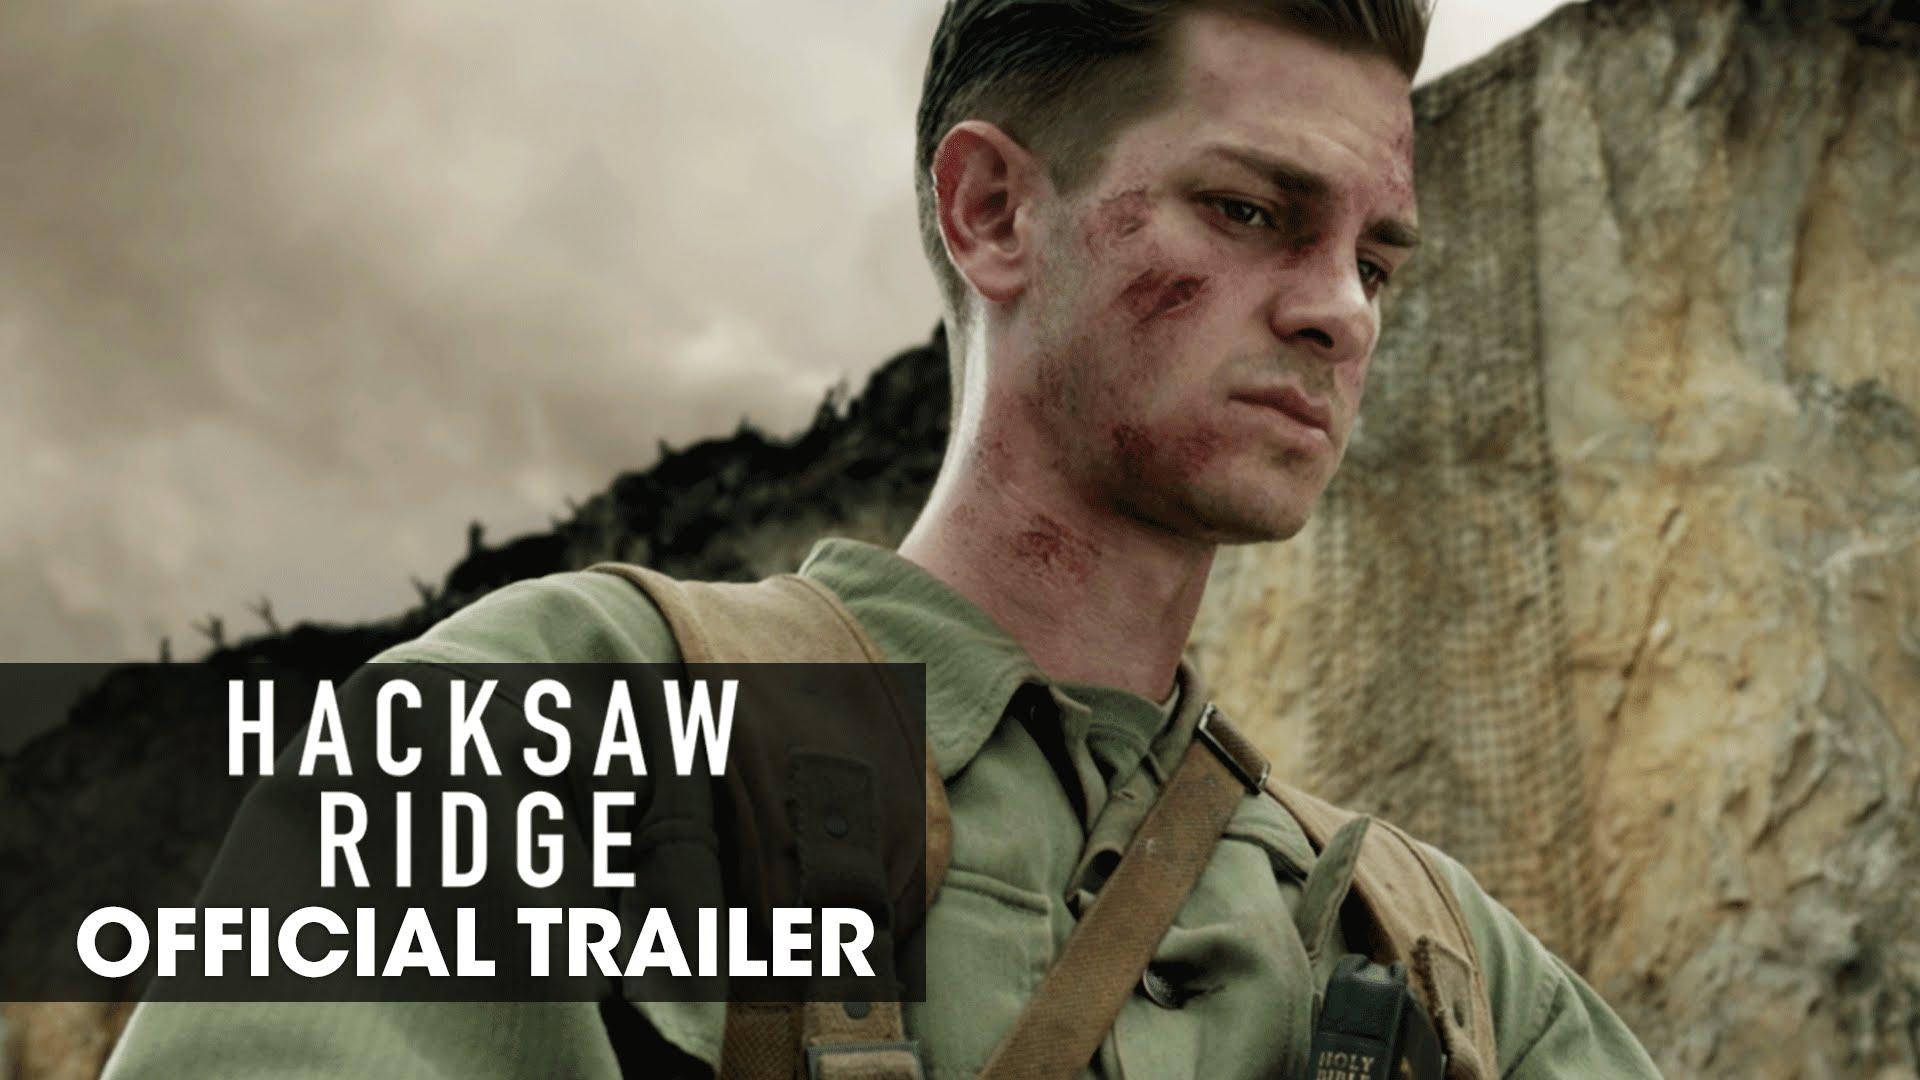 Andrew Garfield Cute Wallpaper Hacksaw Ridge 2016 Movie Official Trailer Quot Believe